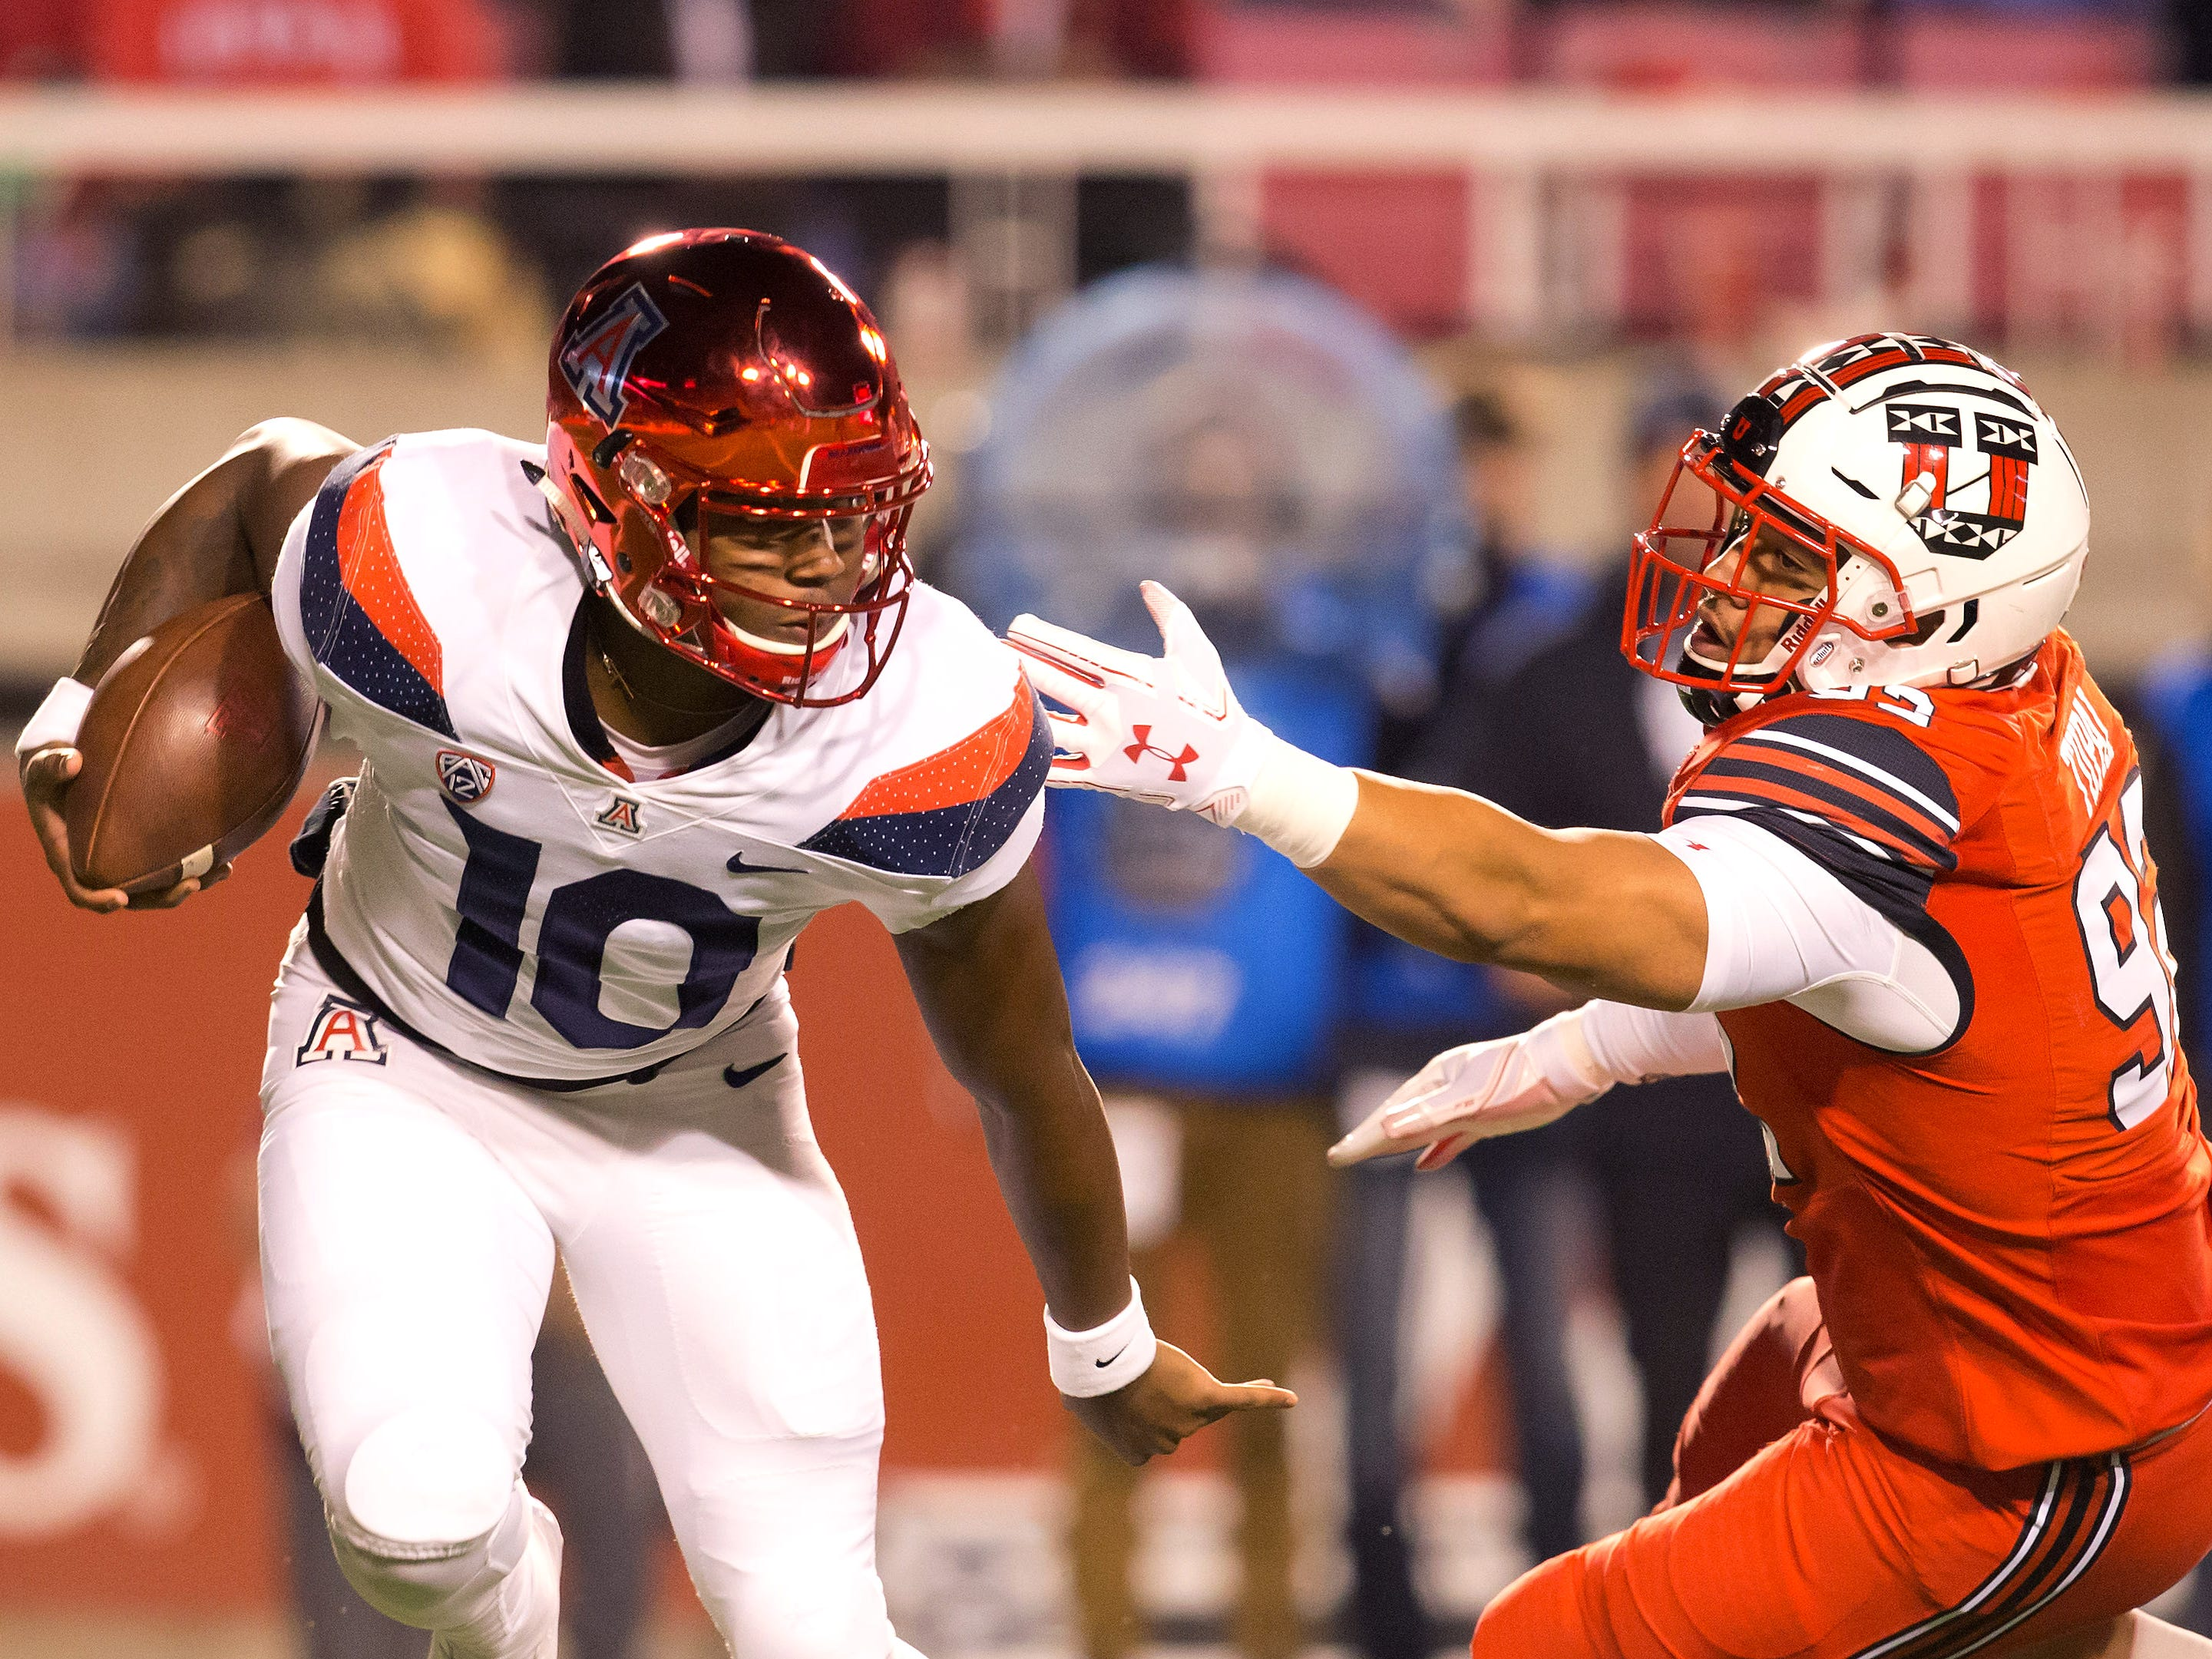 Oct 12, 2018; Salt Lake City, UT, USA; Arizona Wildcats quarterback Jamarye Joiner (10) avoids the tackle of Utah Utes defensive end Maxs Tupai (92) during the first half at Rice-Eccles Stadium.